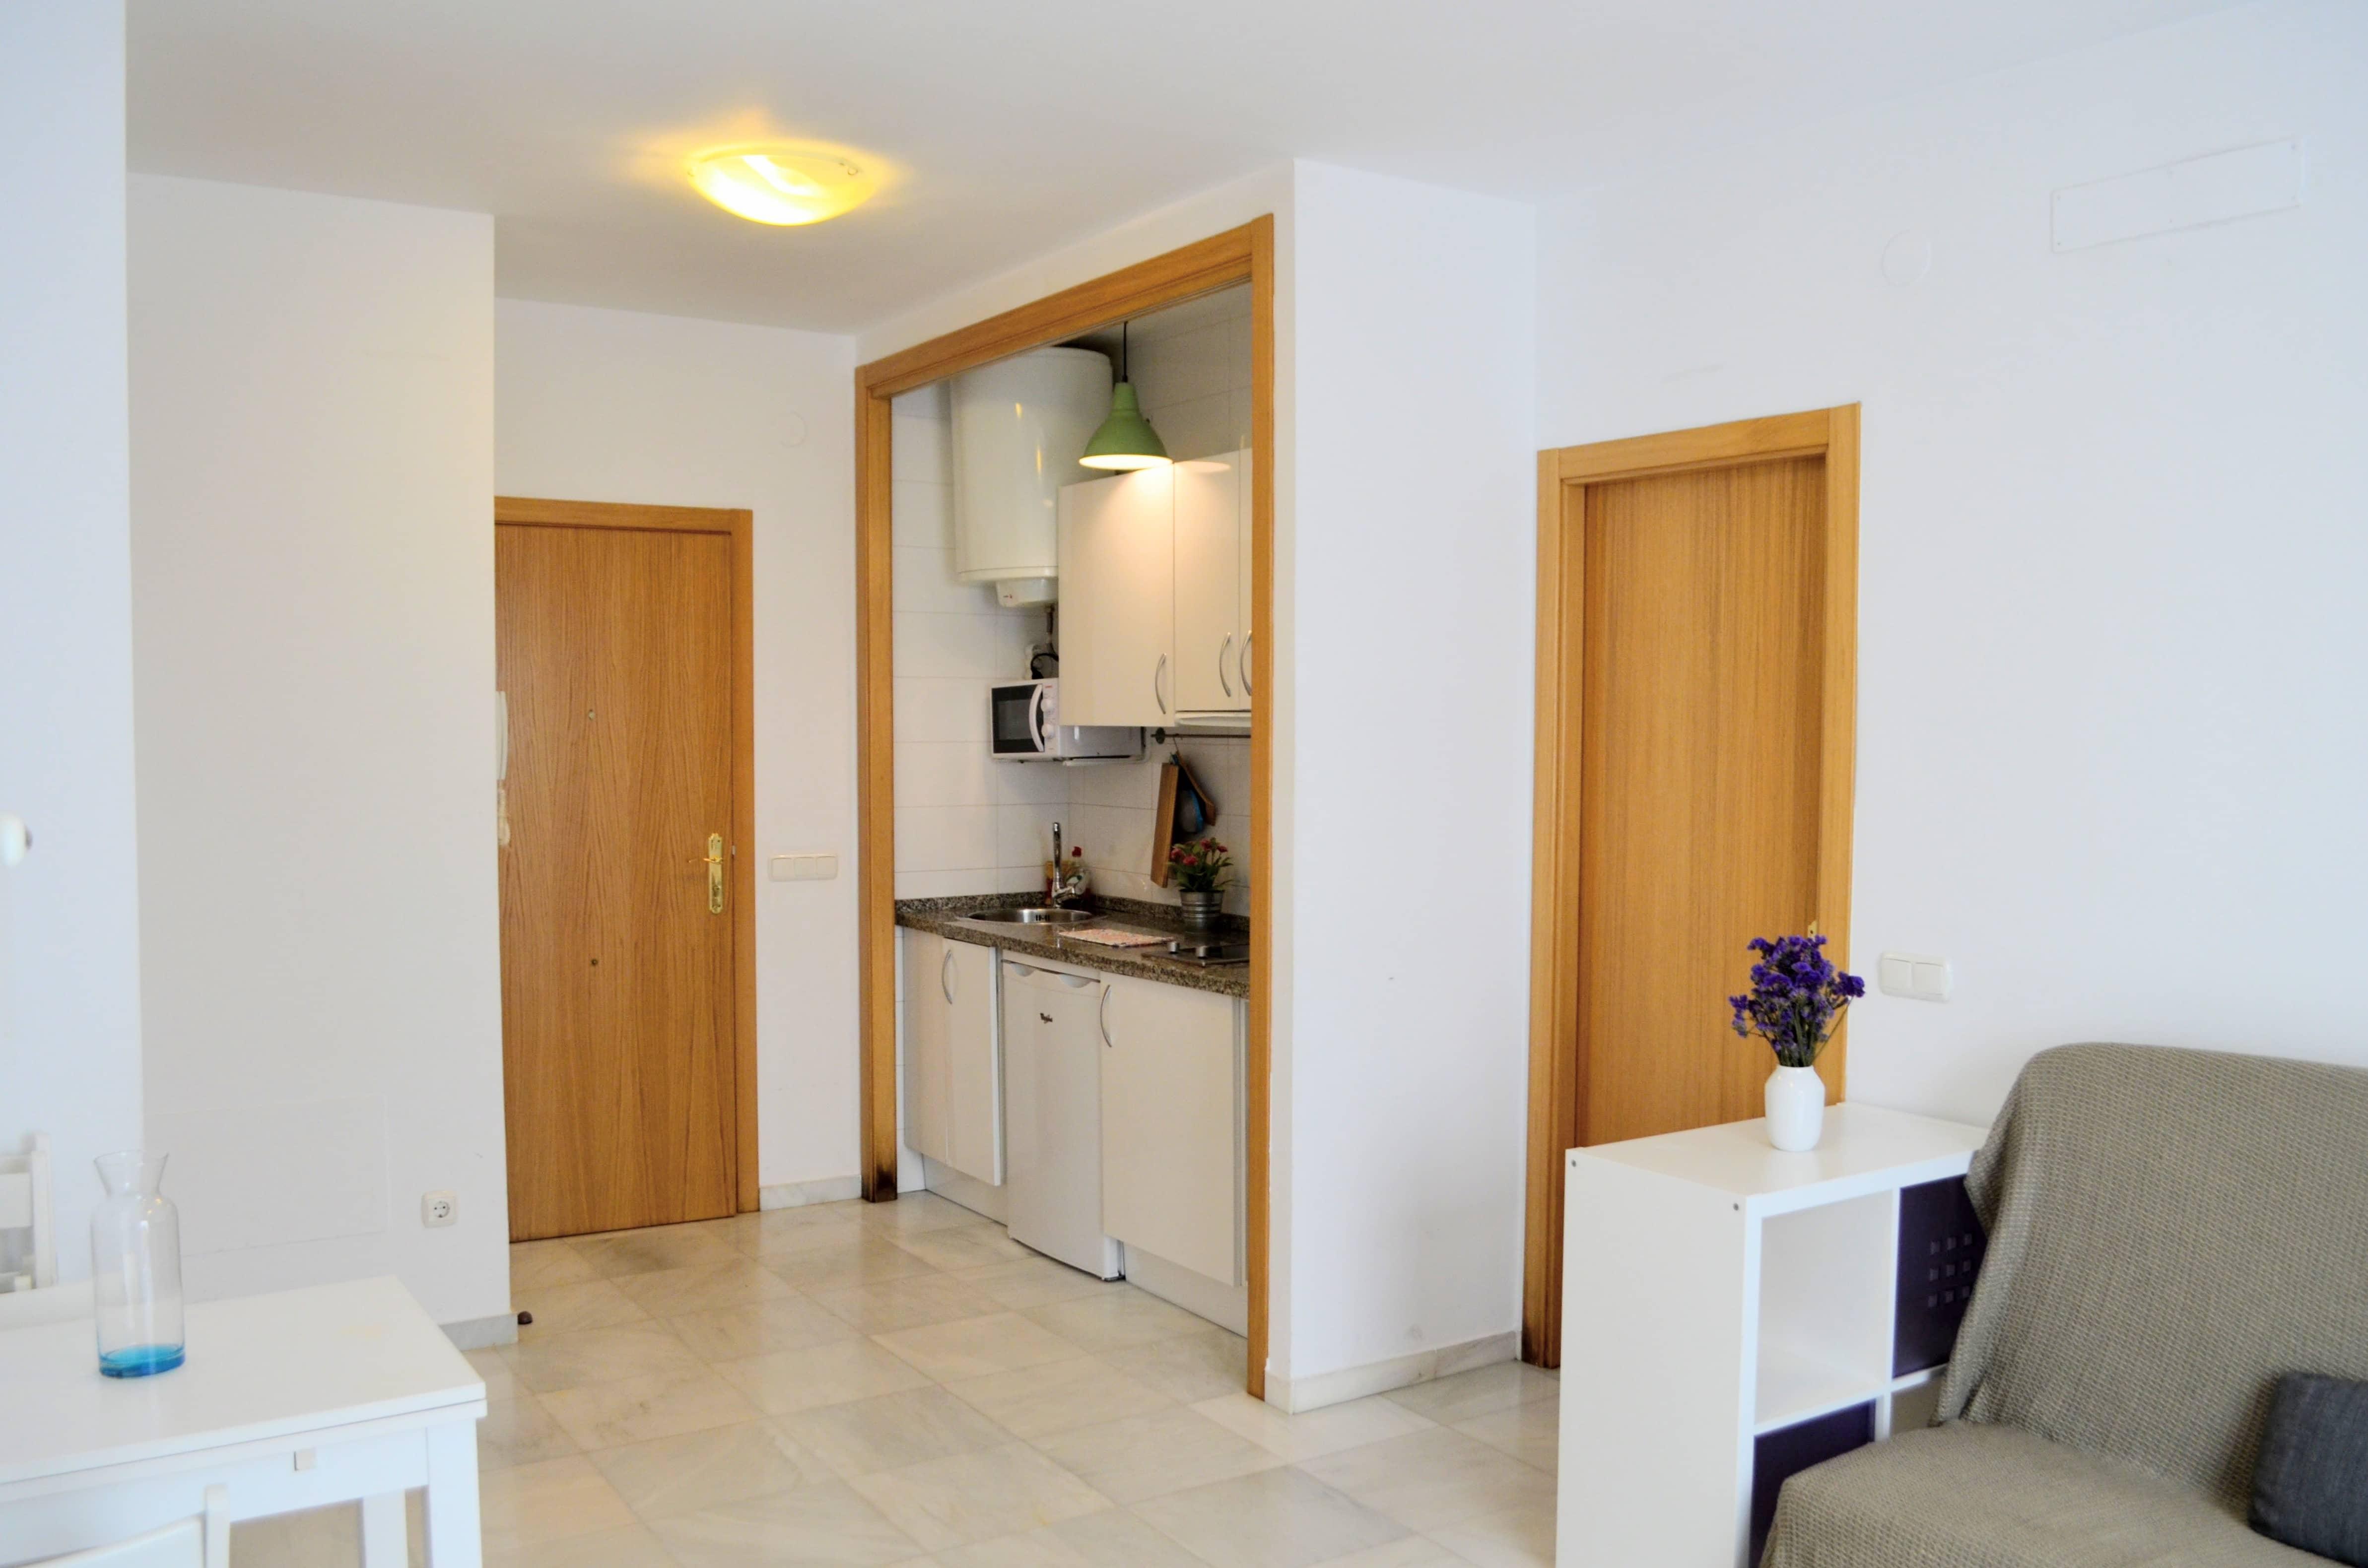 Balneario con dormitorio y terraza privada  0447